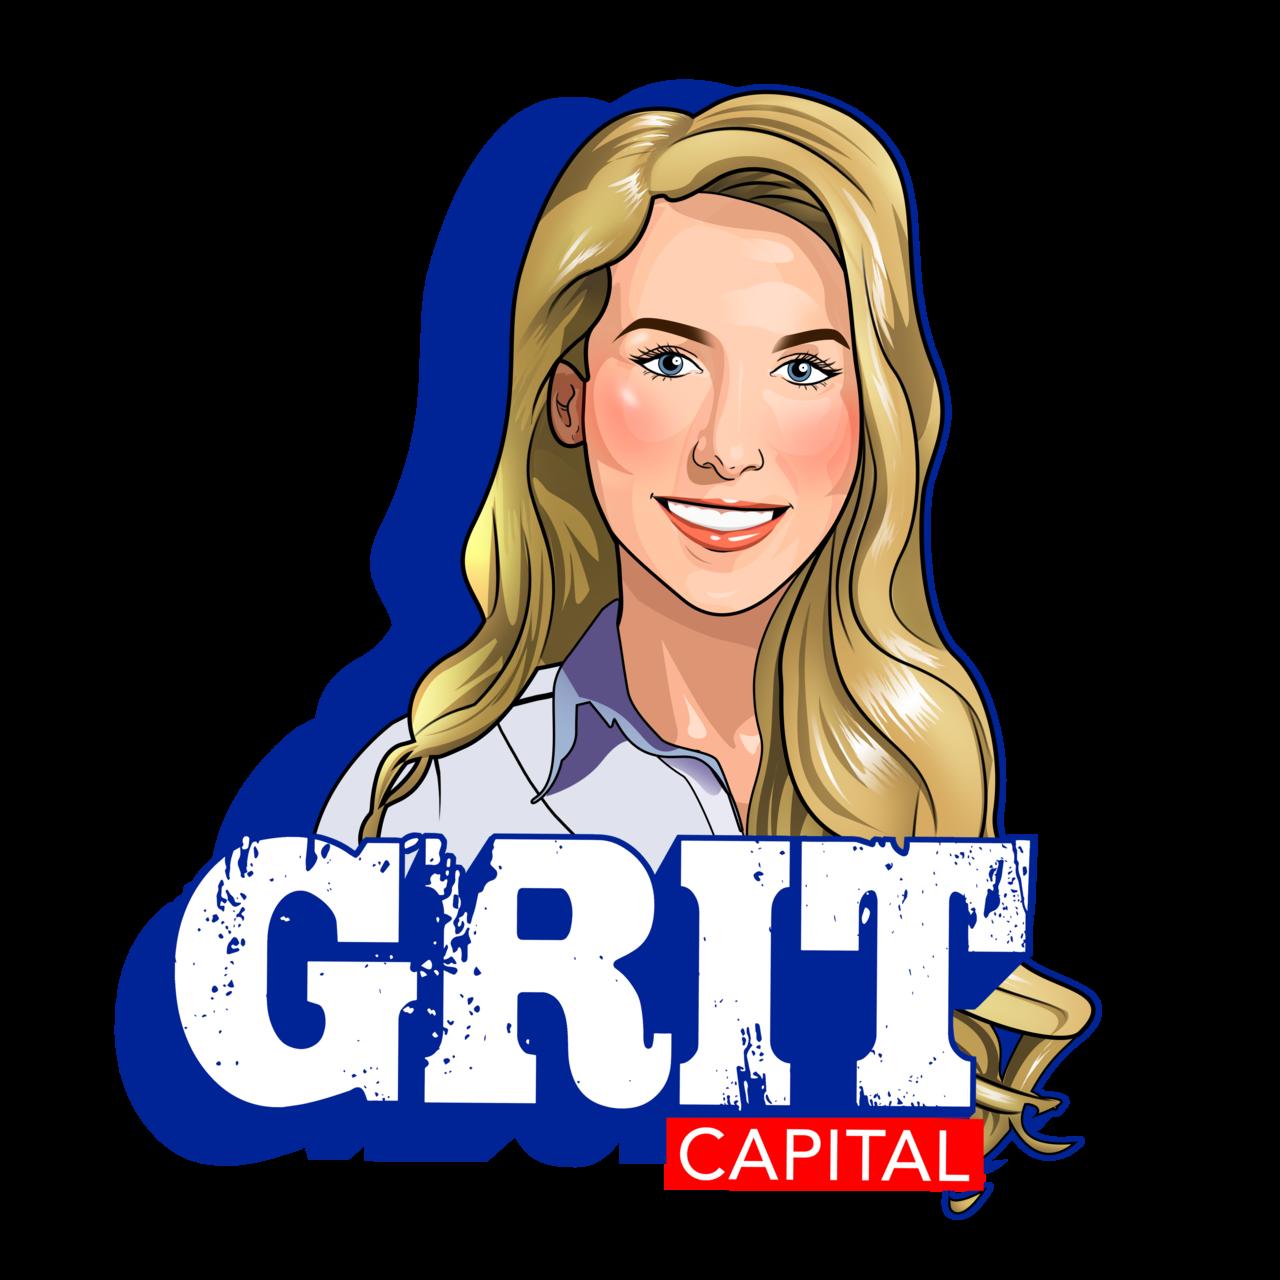 Grit Capital (格瑞特资本)